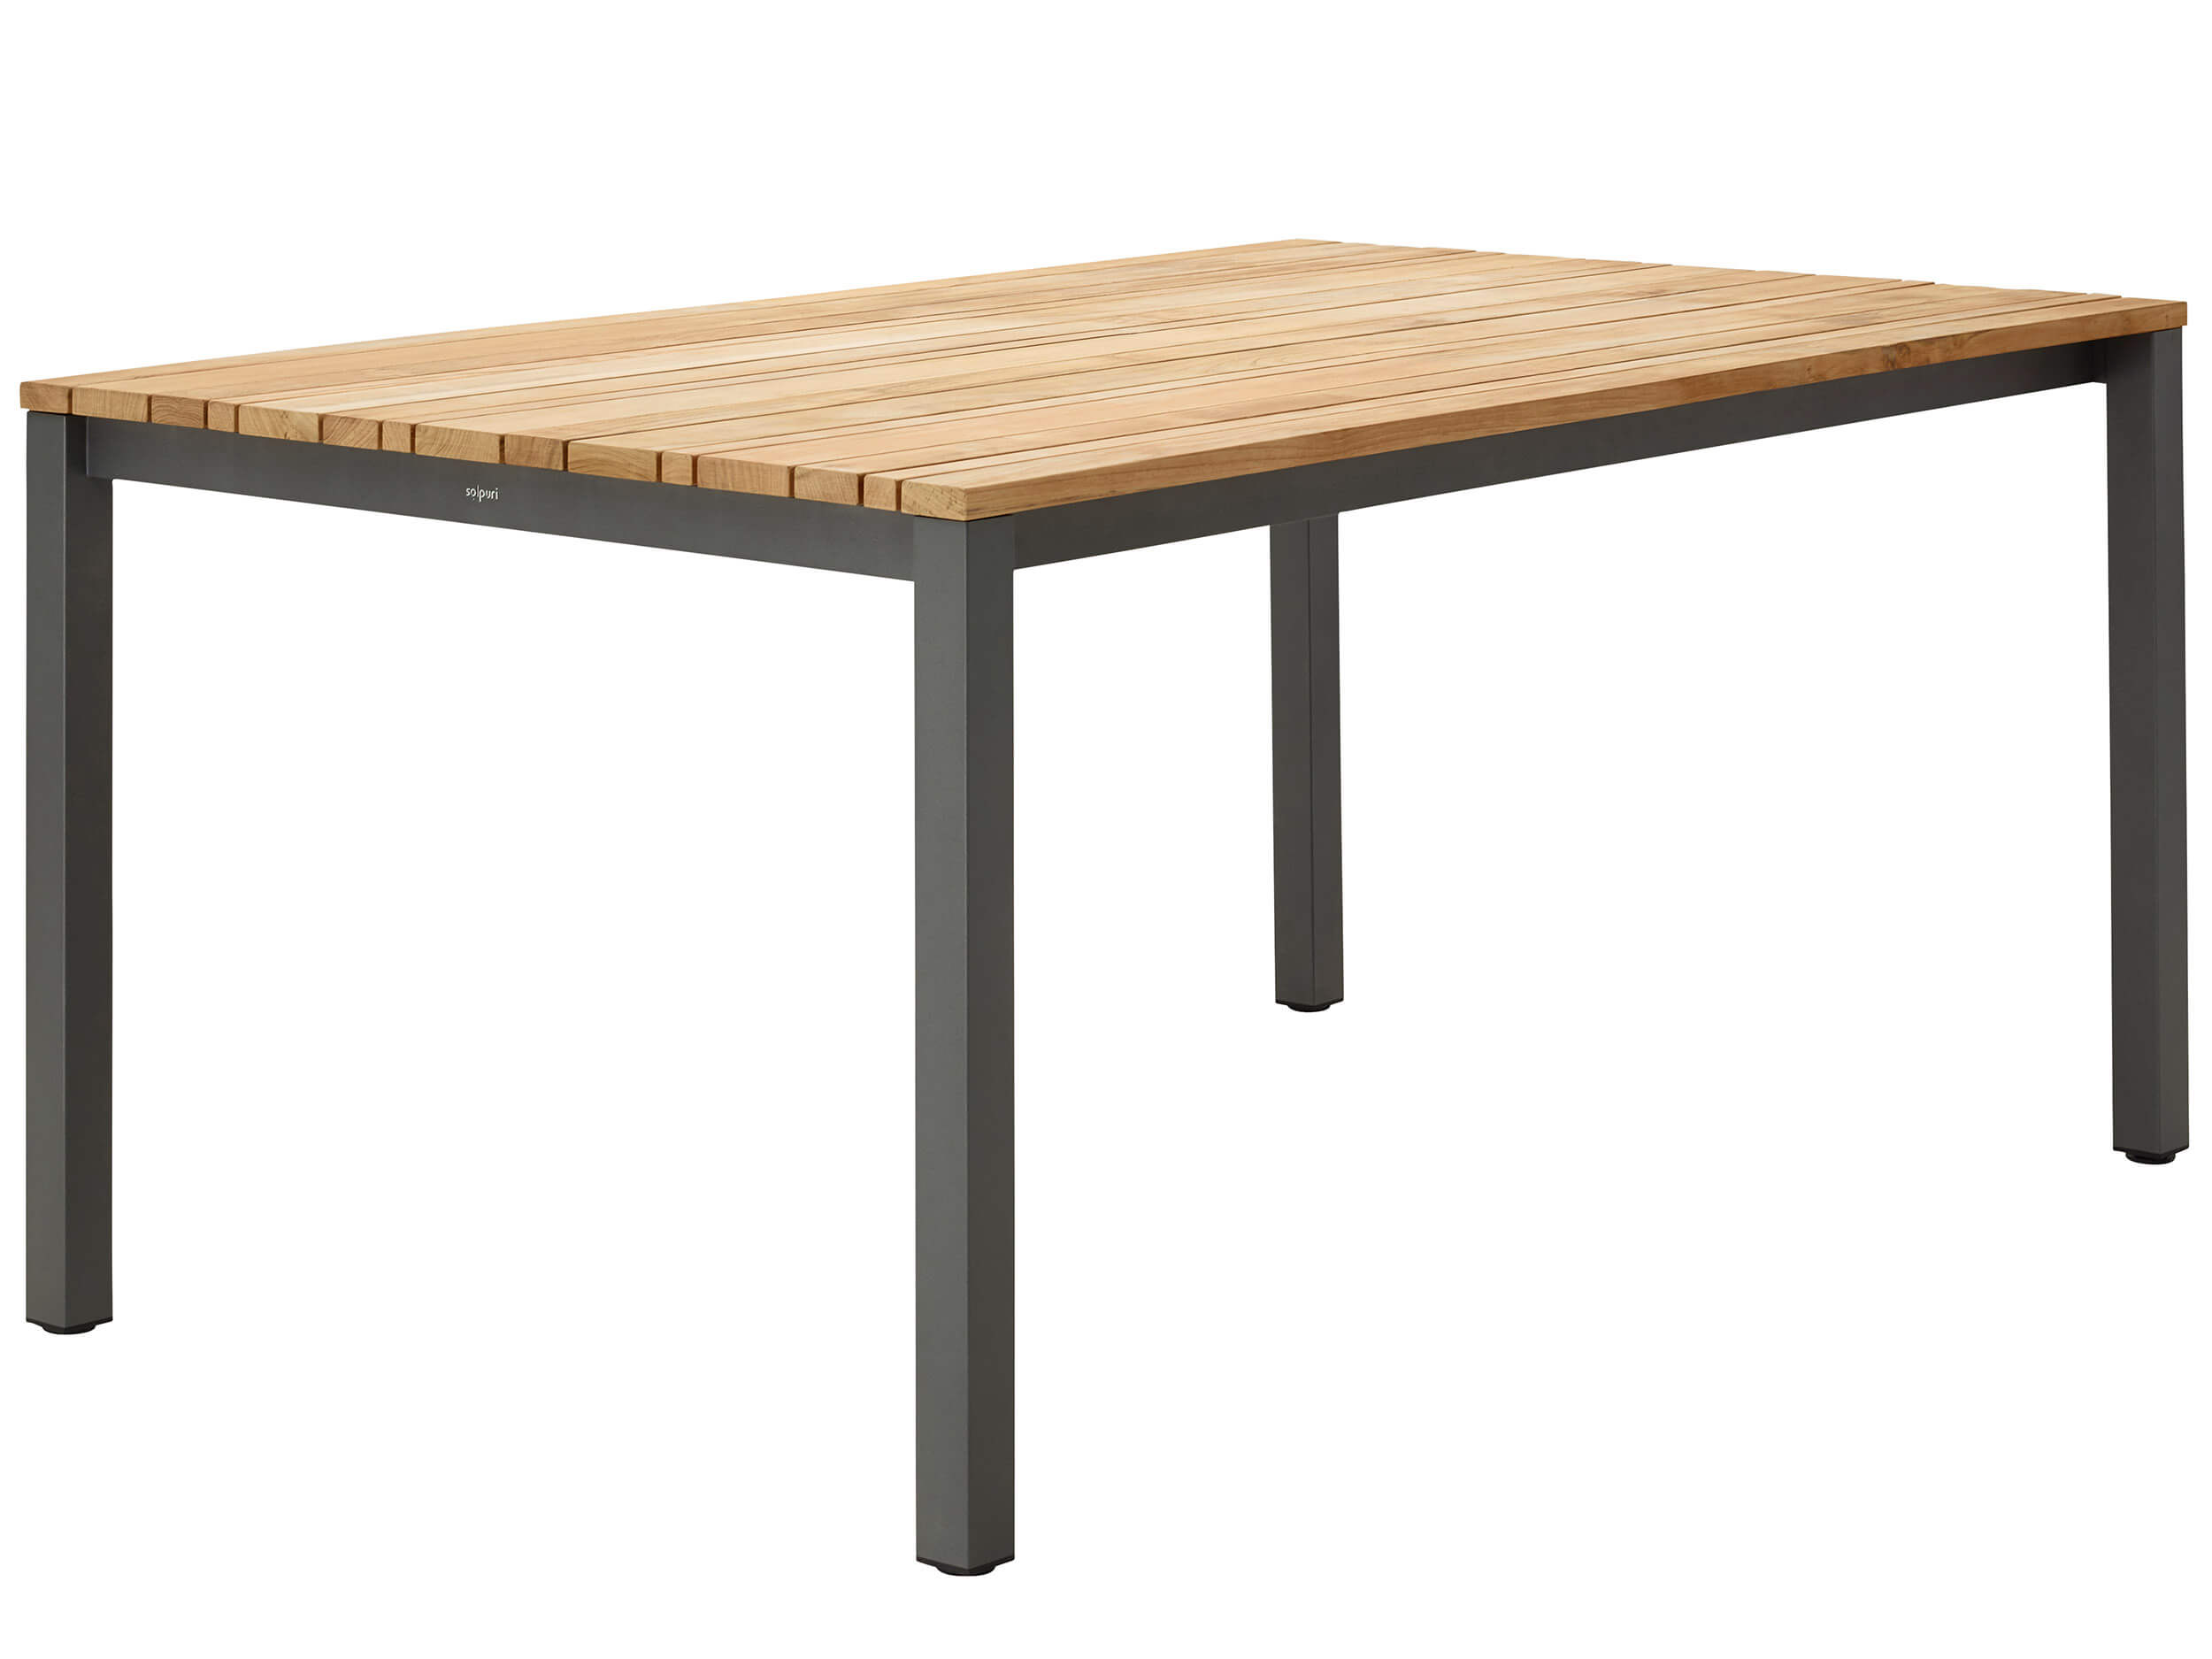 solpuri classic alu dining tisch teak gartenm bel l nse. Black Bedroom Furniture Sets. Home Design Ideas